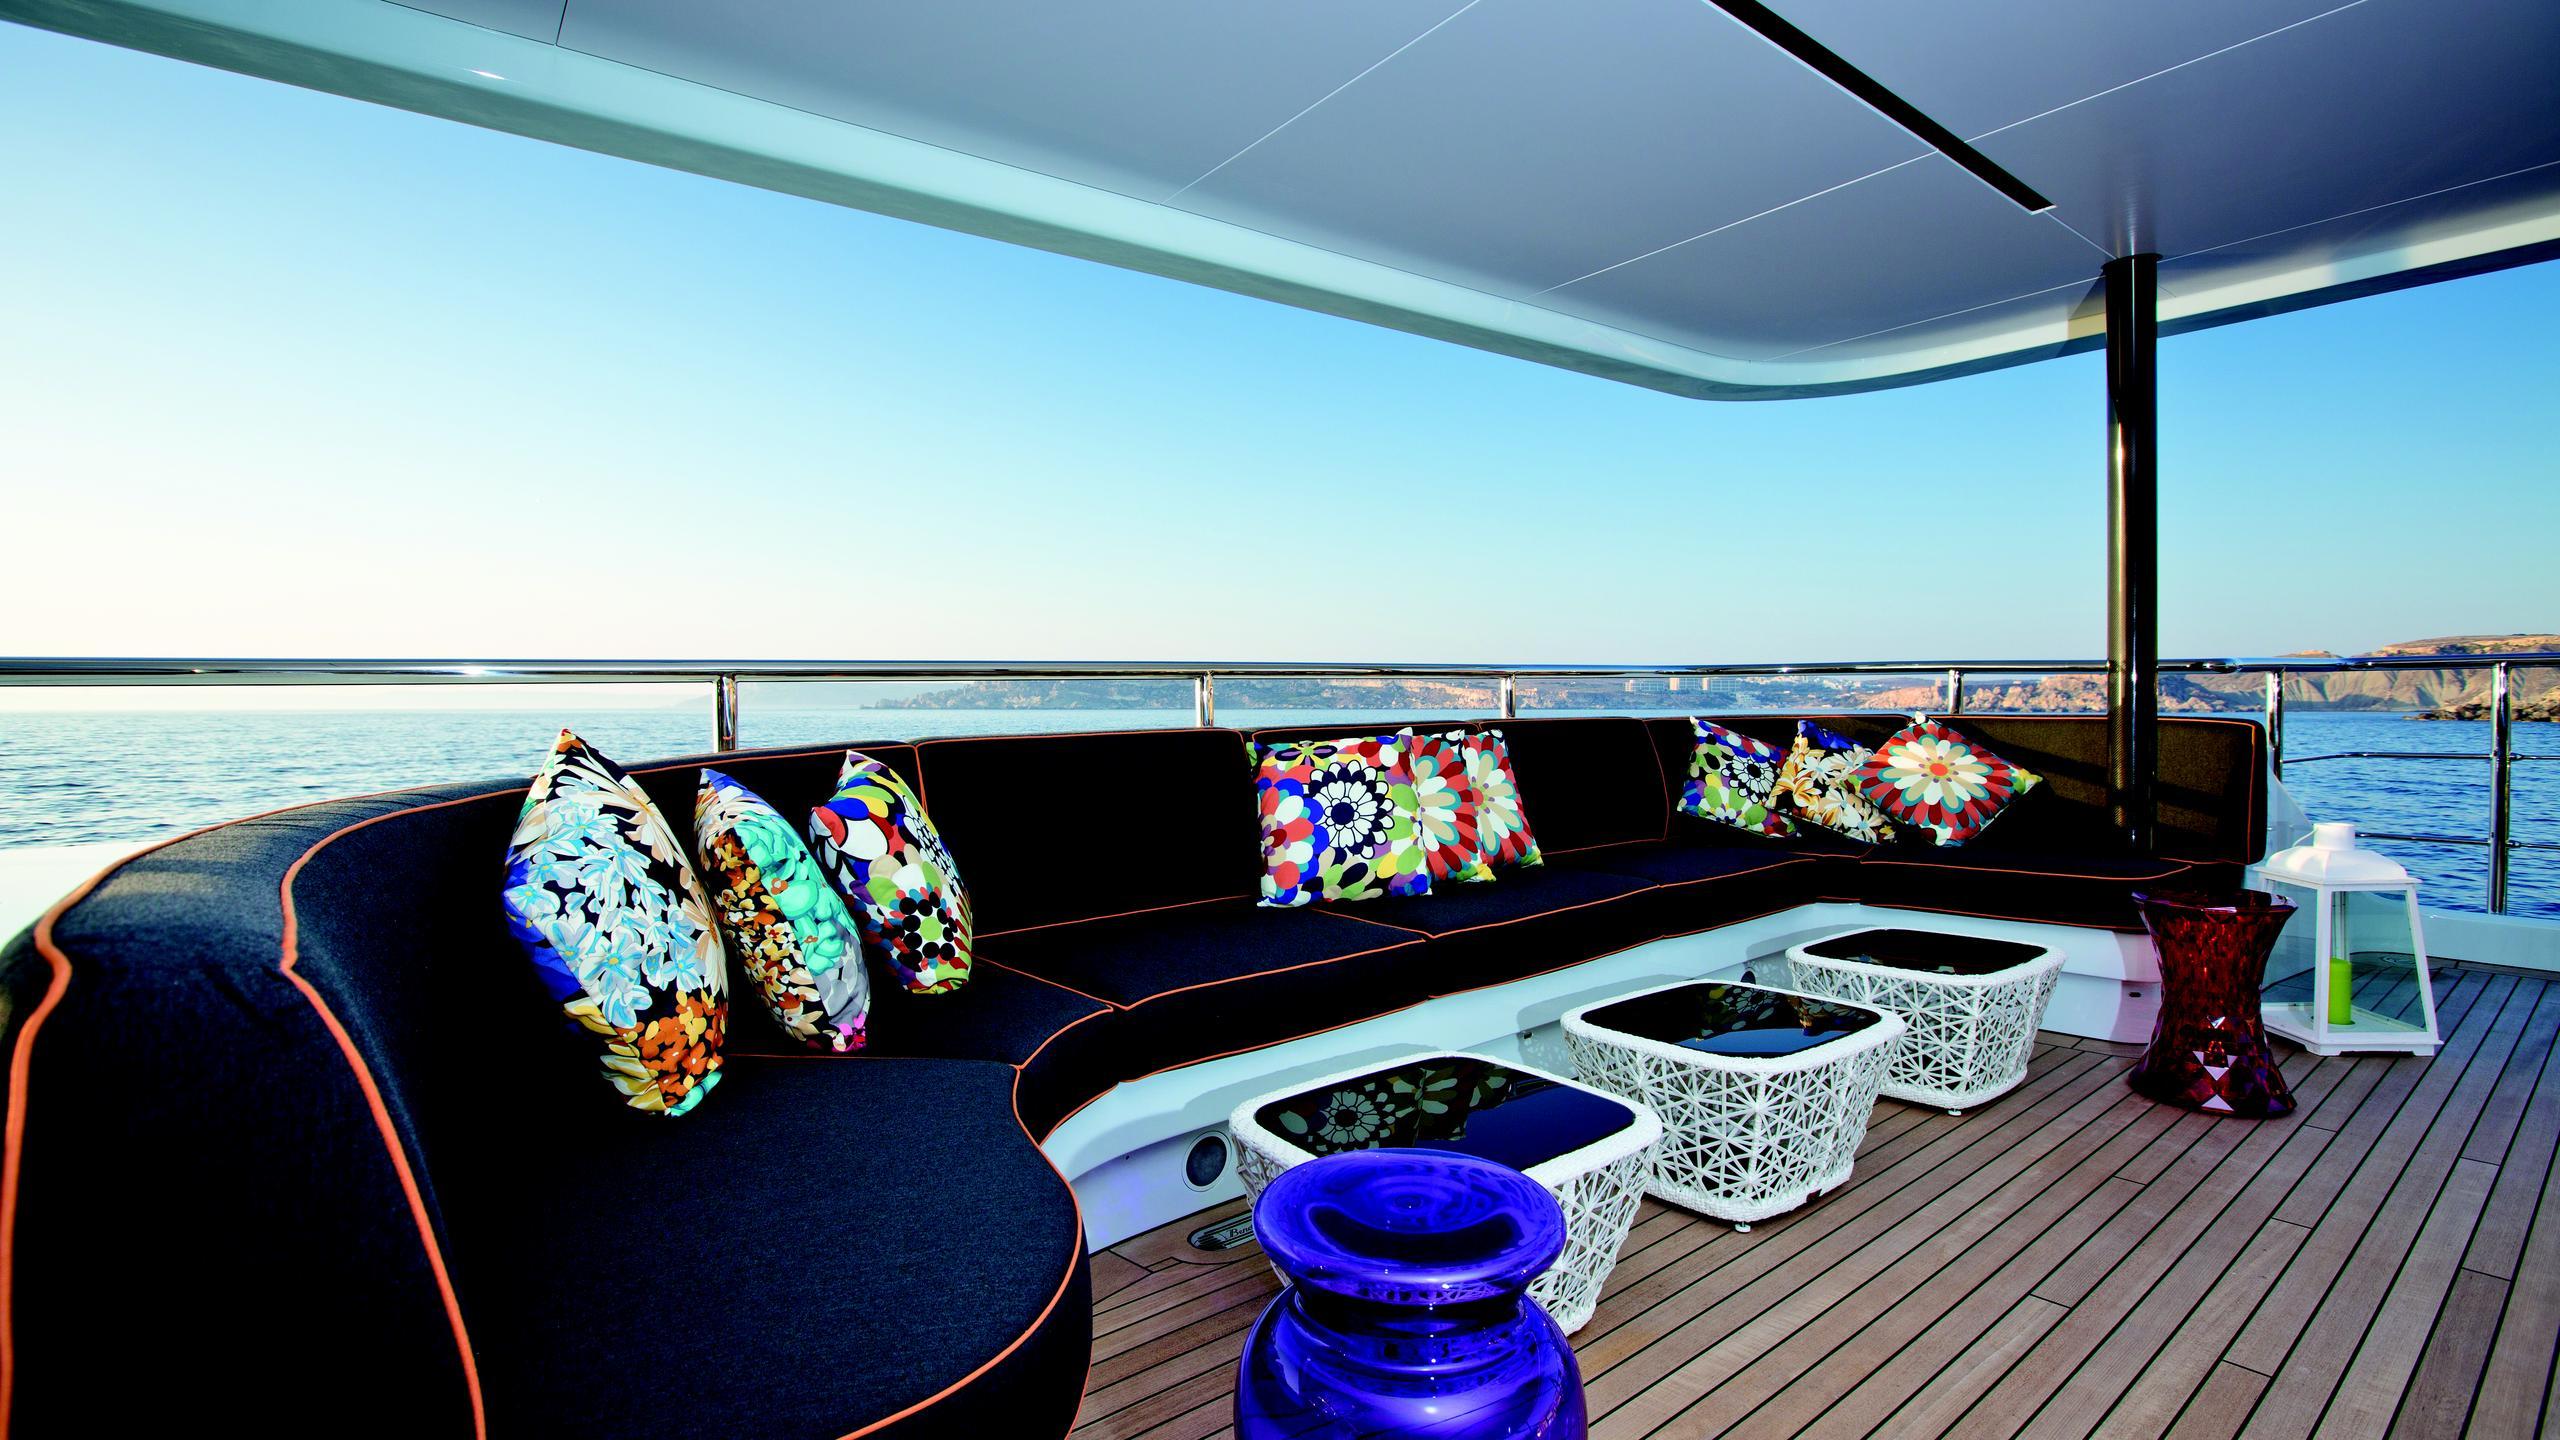 ocean-paradise-yacht-aft-deck